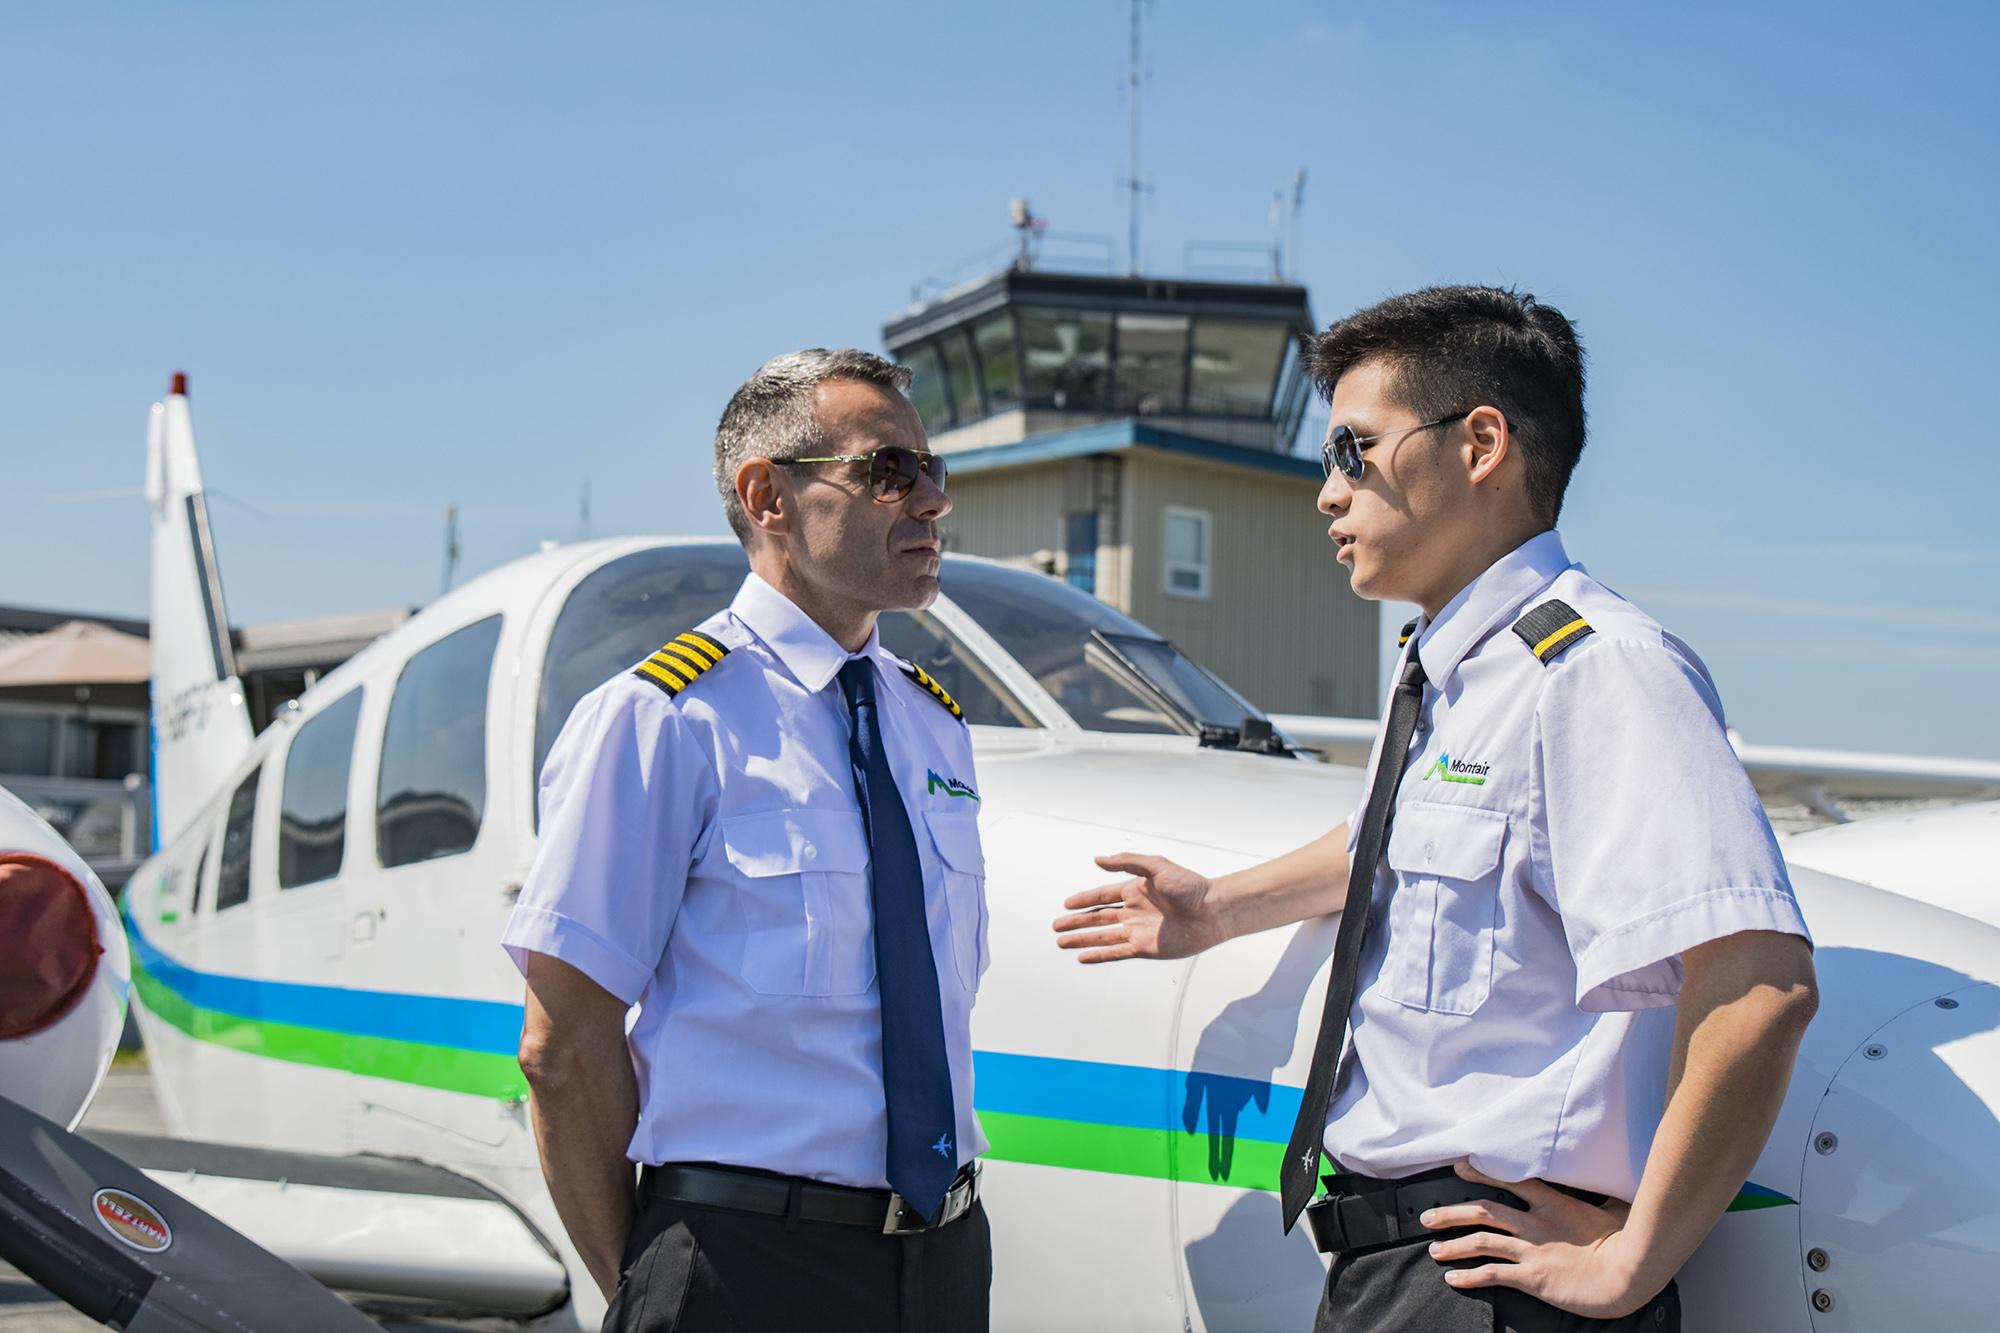 Flight instructor with air cadet